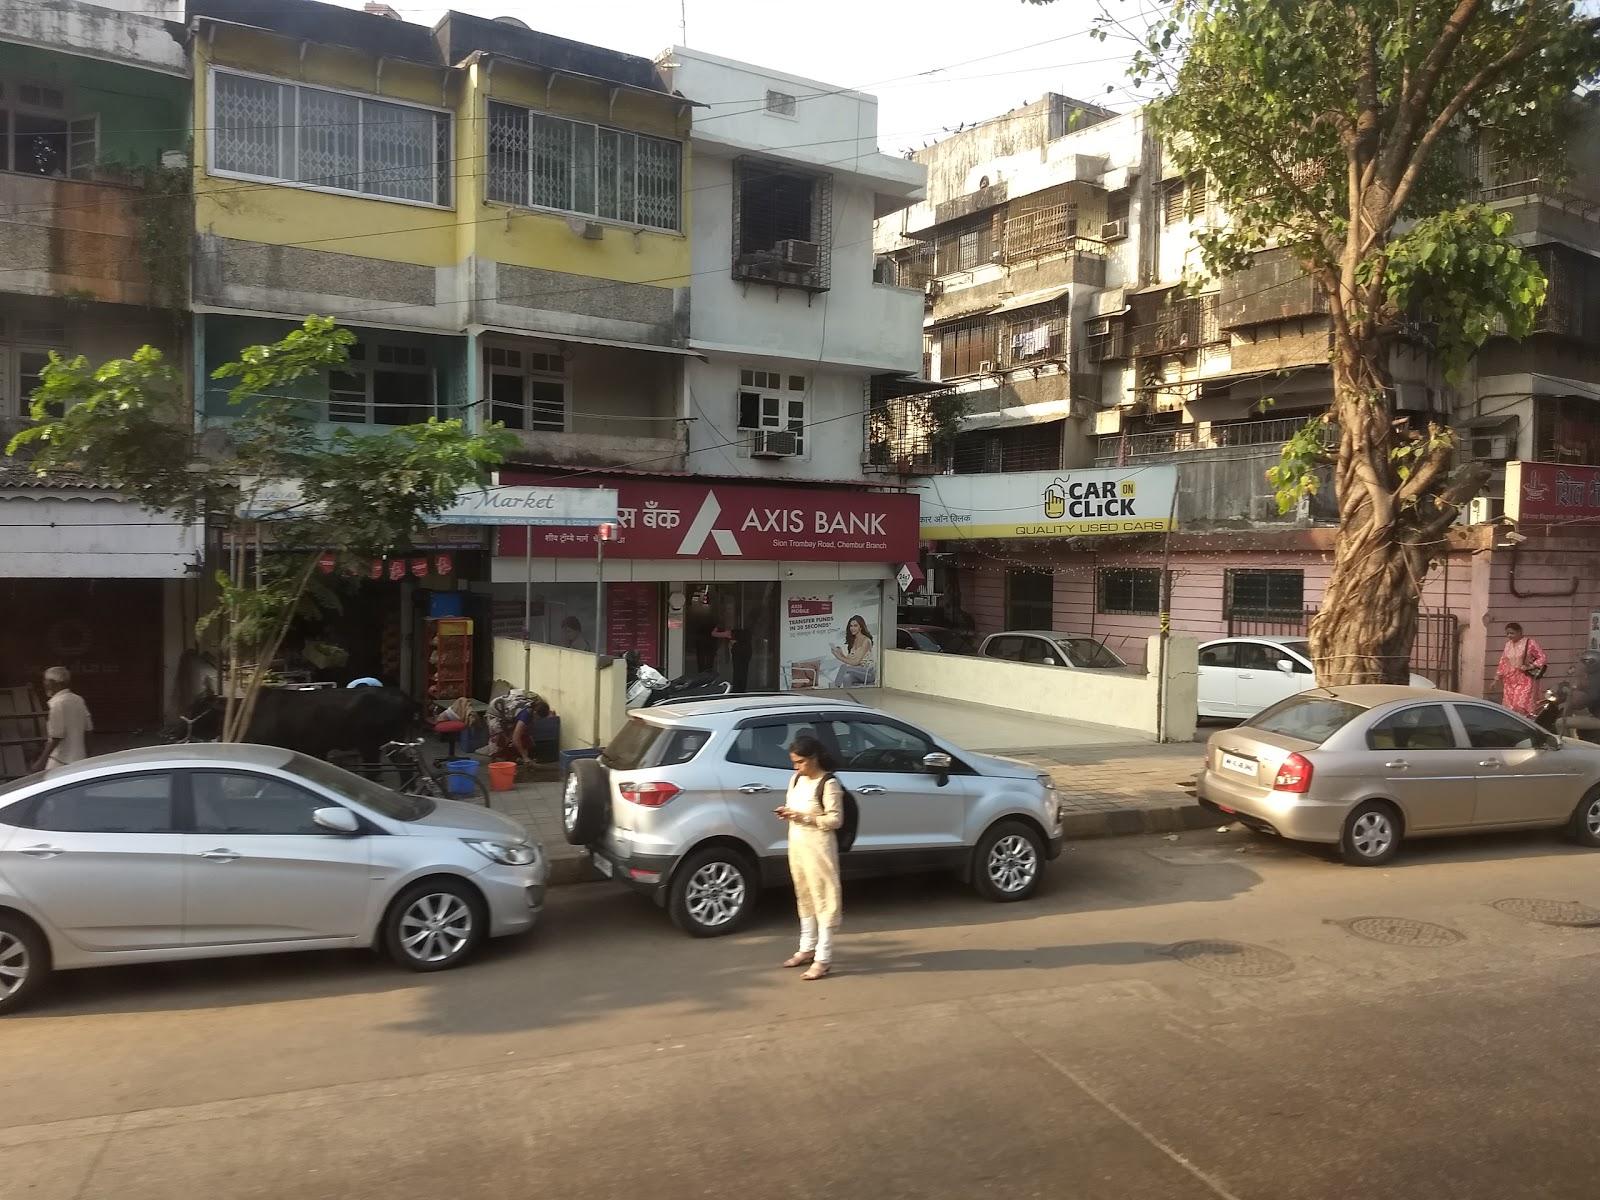 blood bank Axis Bank near Mumbai Maharashtra